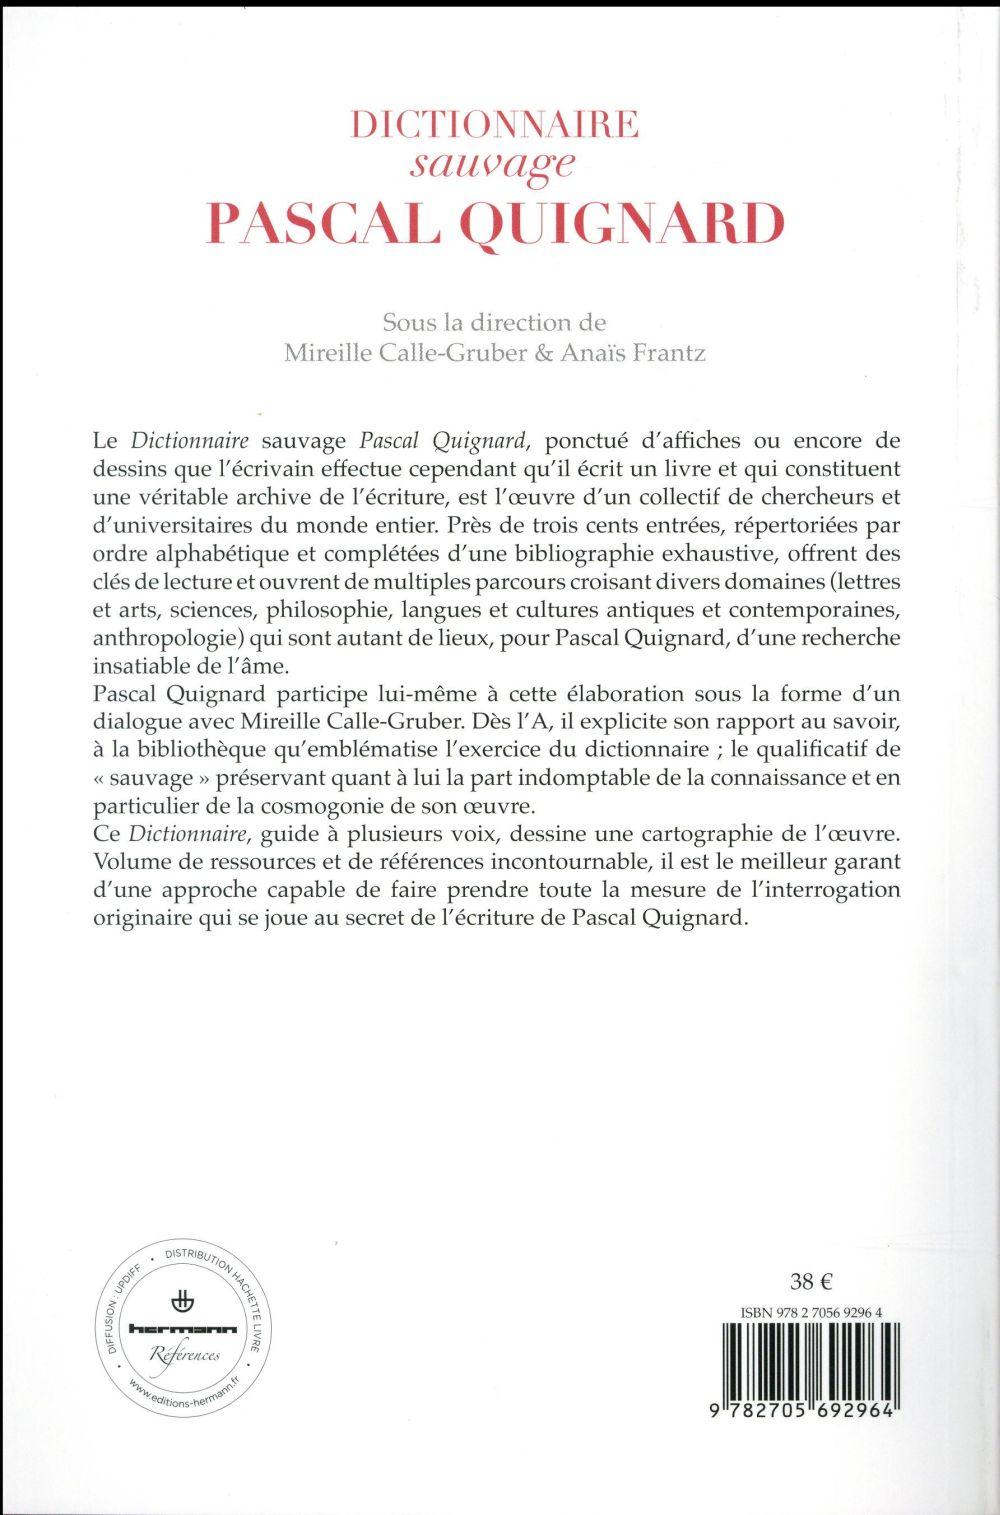 Dictionnaire sauvage Pascal Quignard